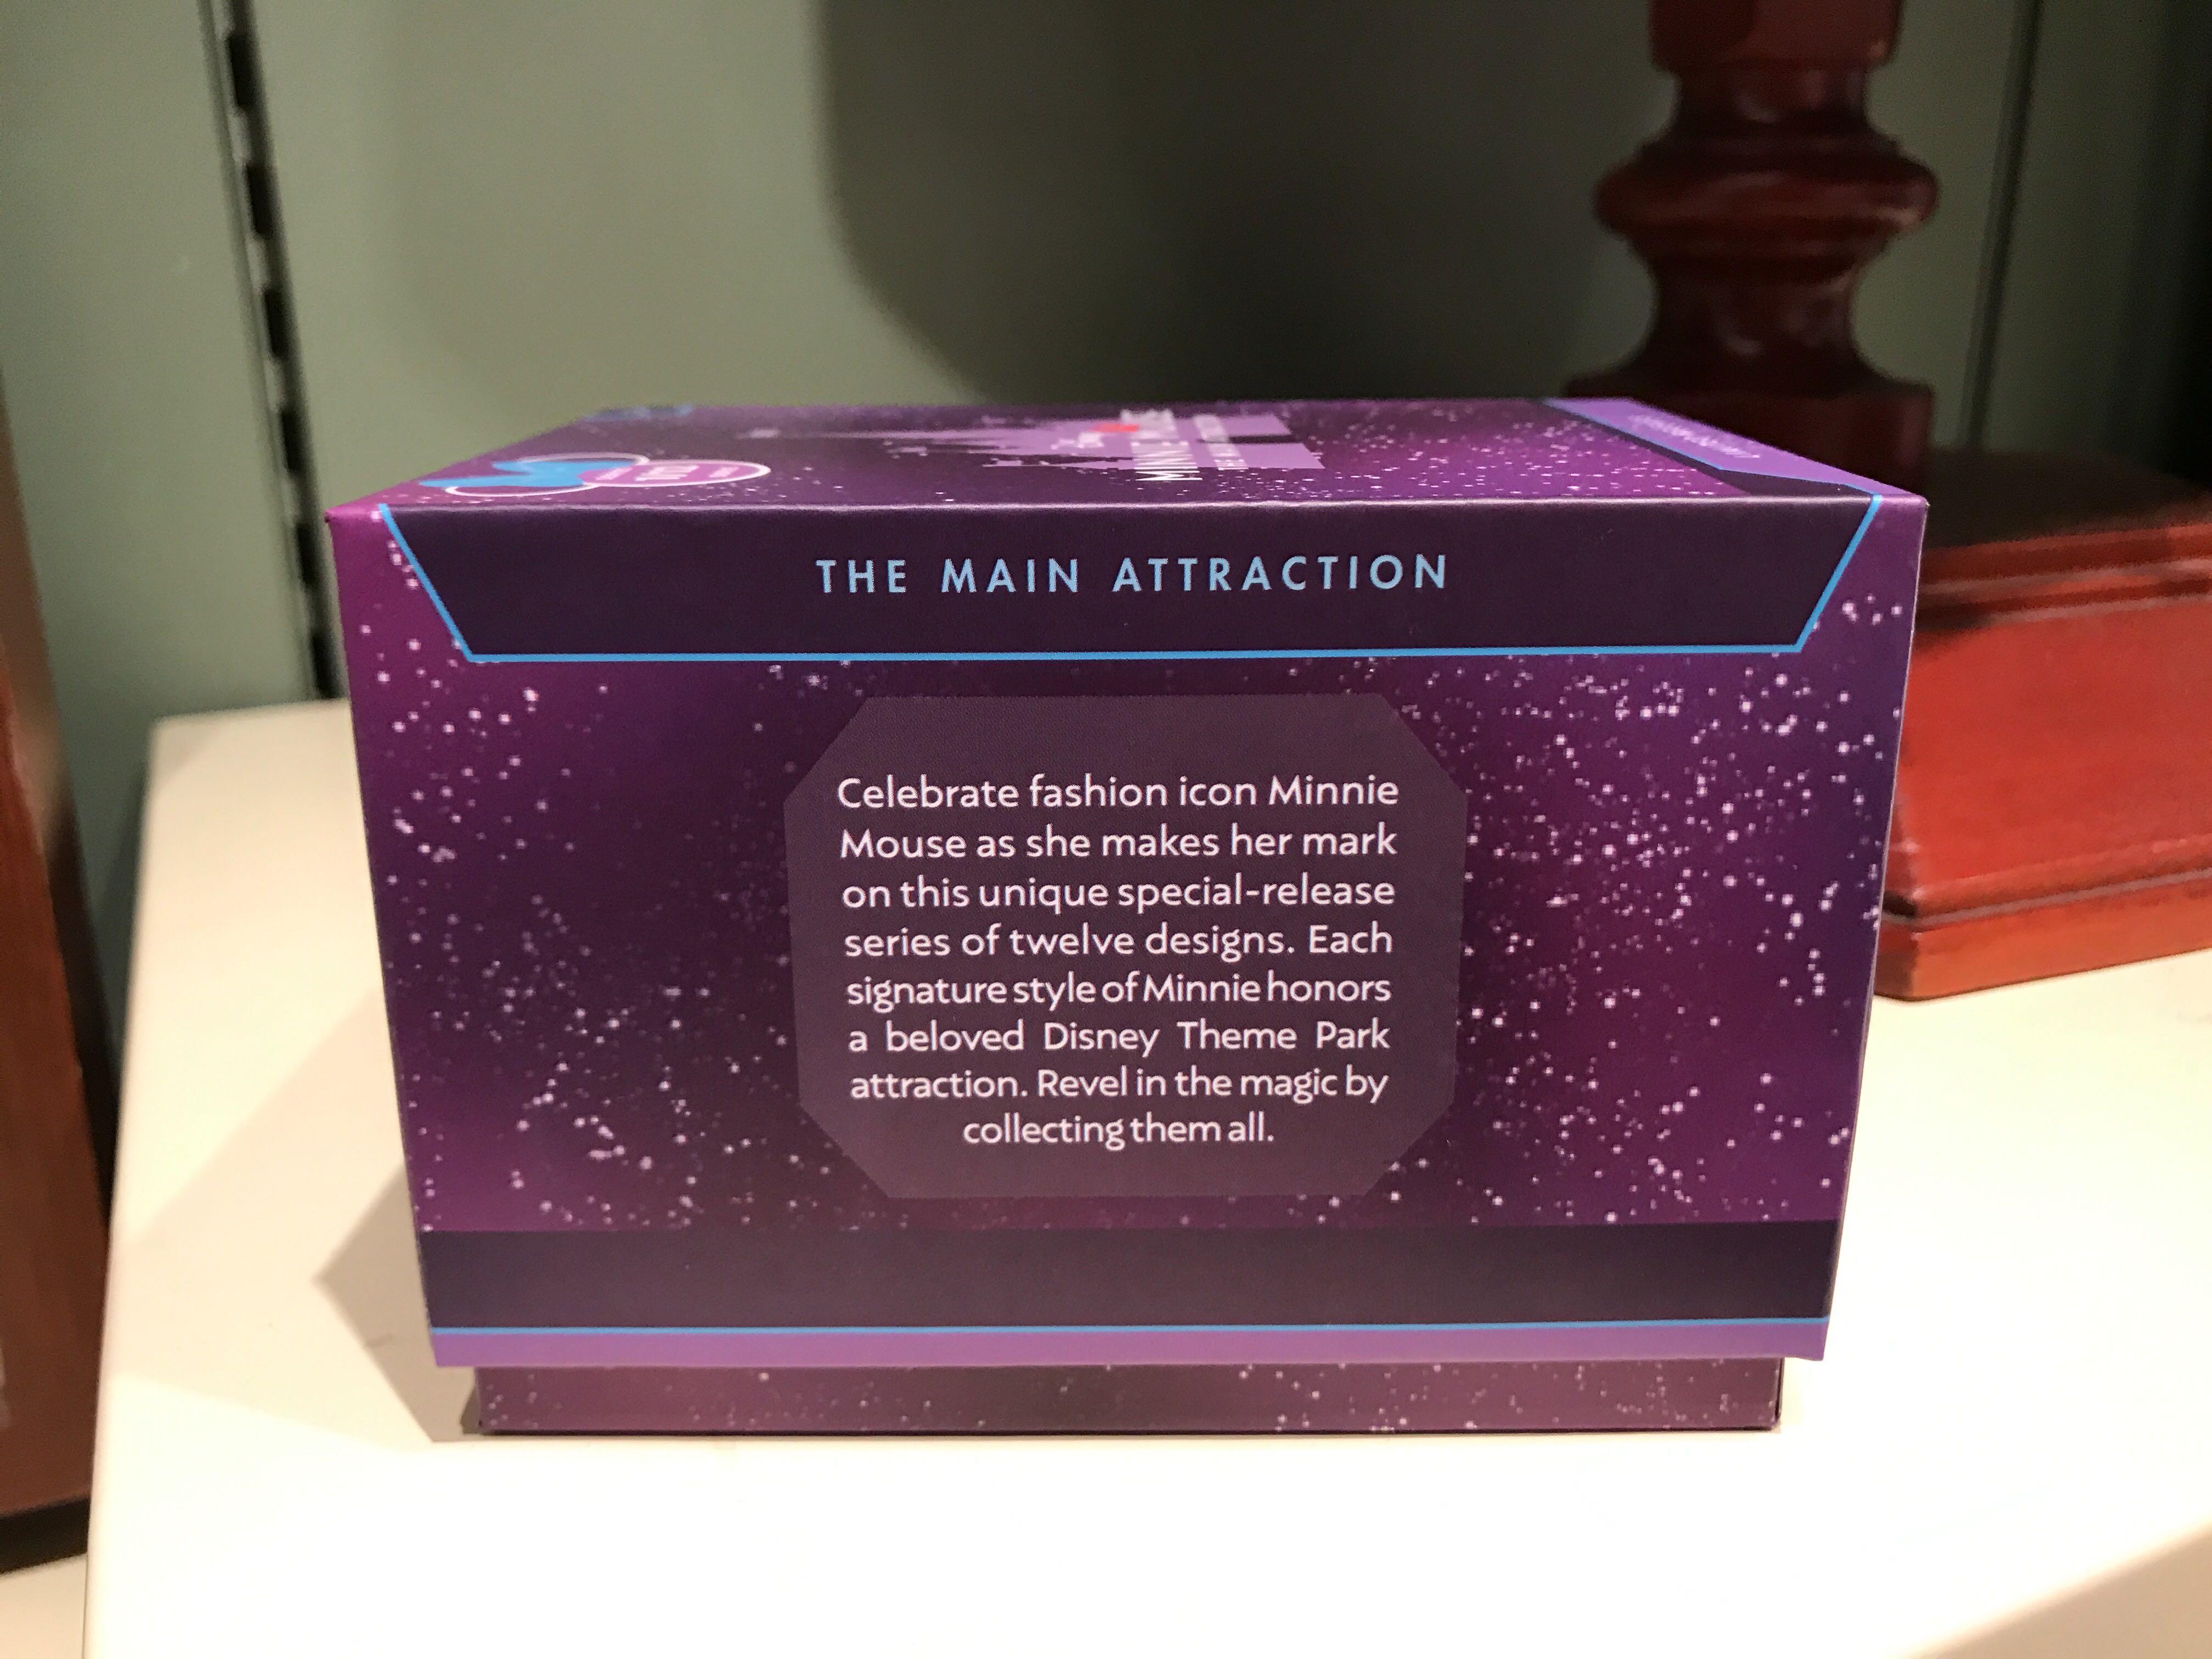 main-attraction-space-magic-band-box-side-2.jpg